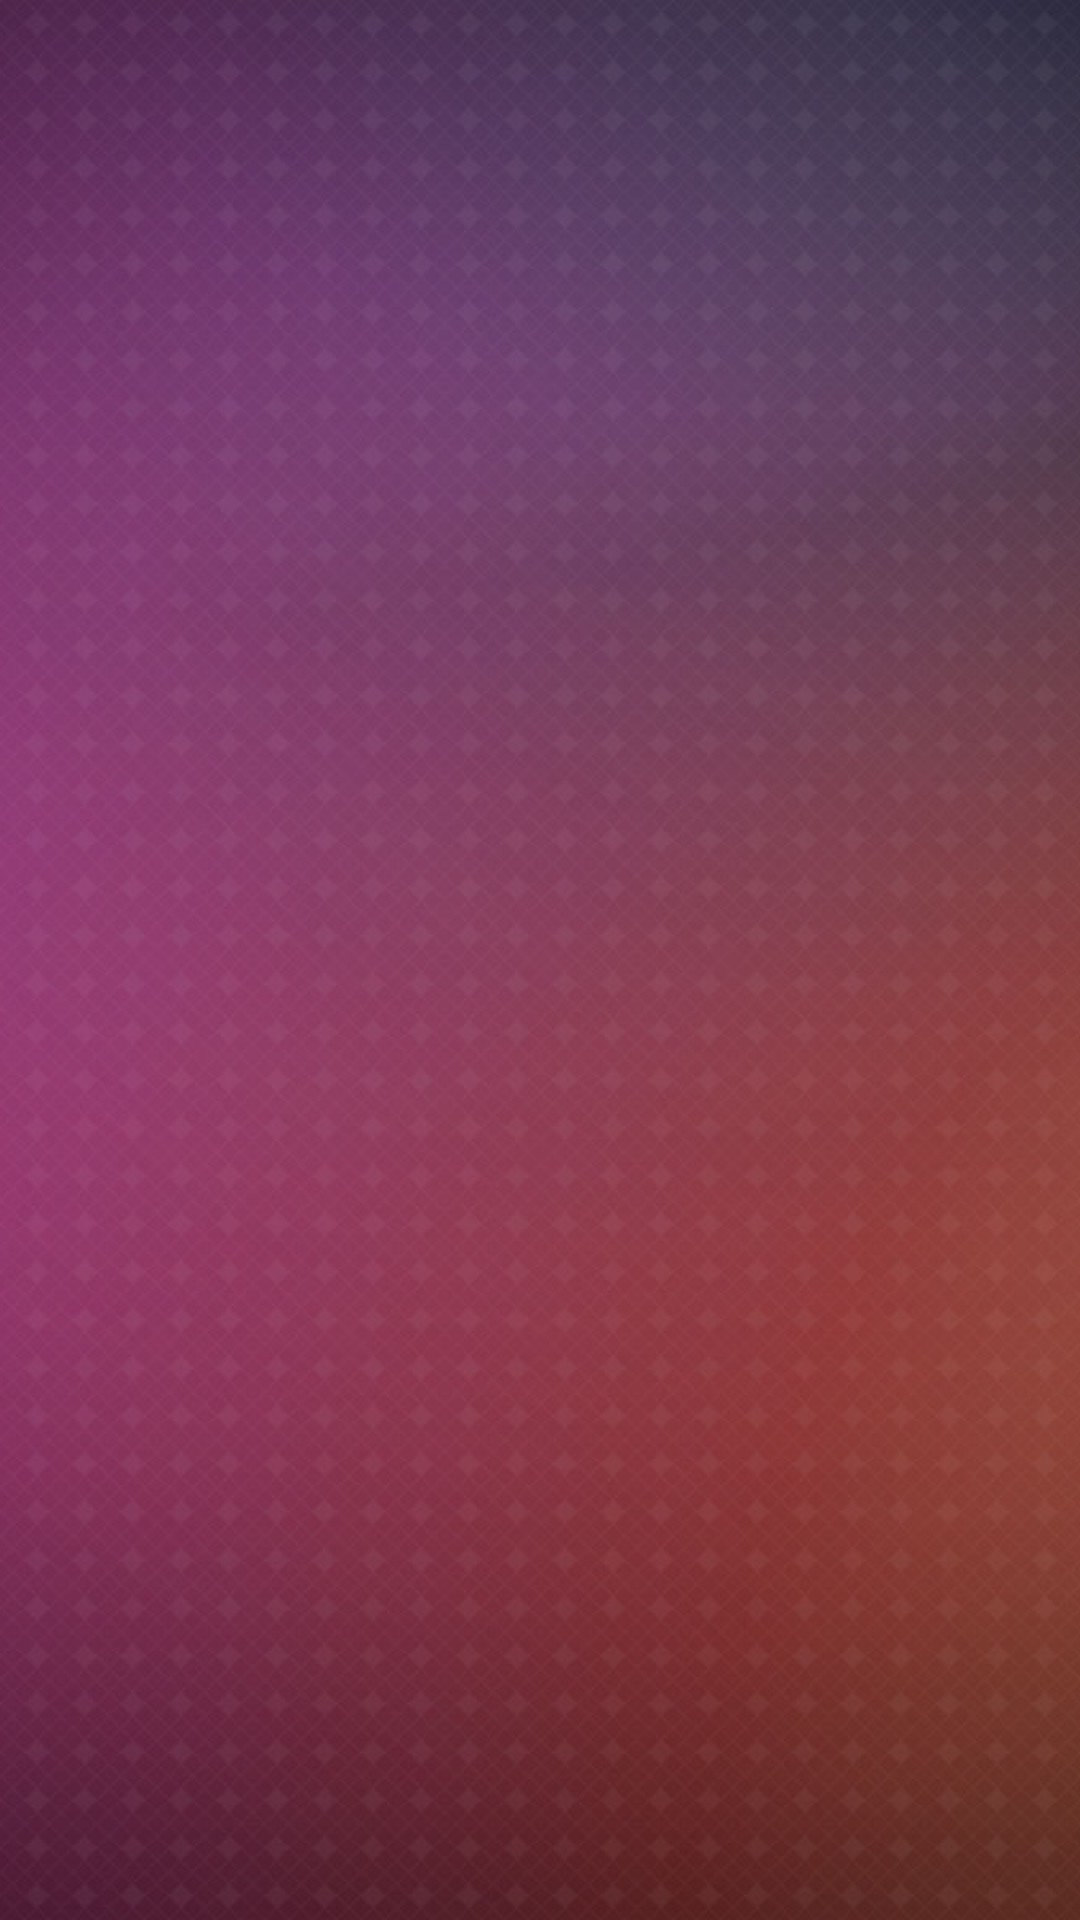 Wallpaper purple, red, black, form